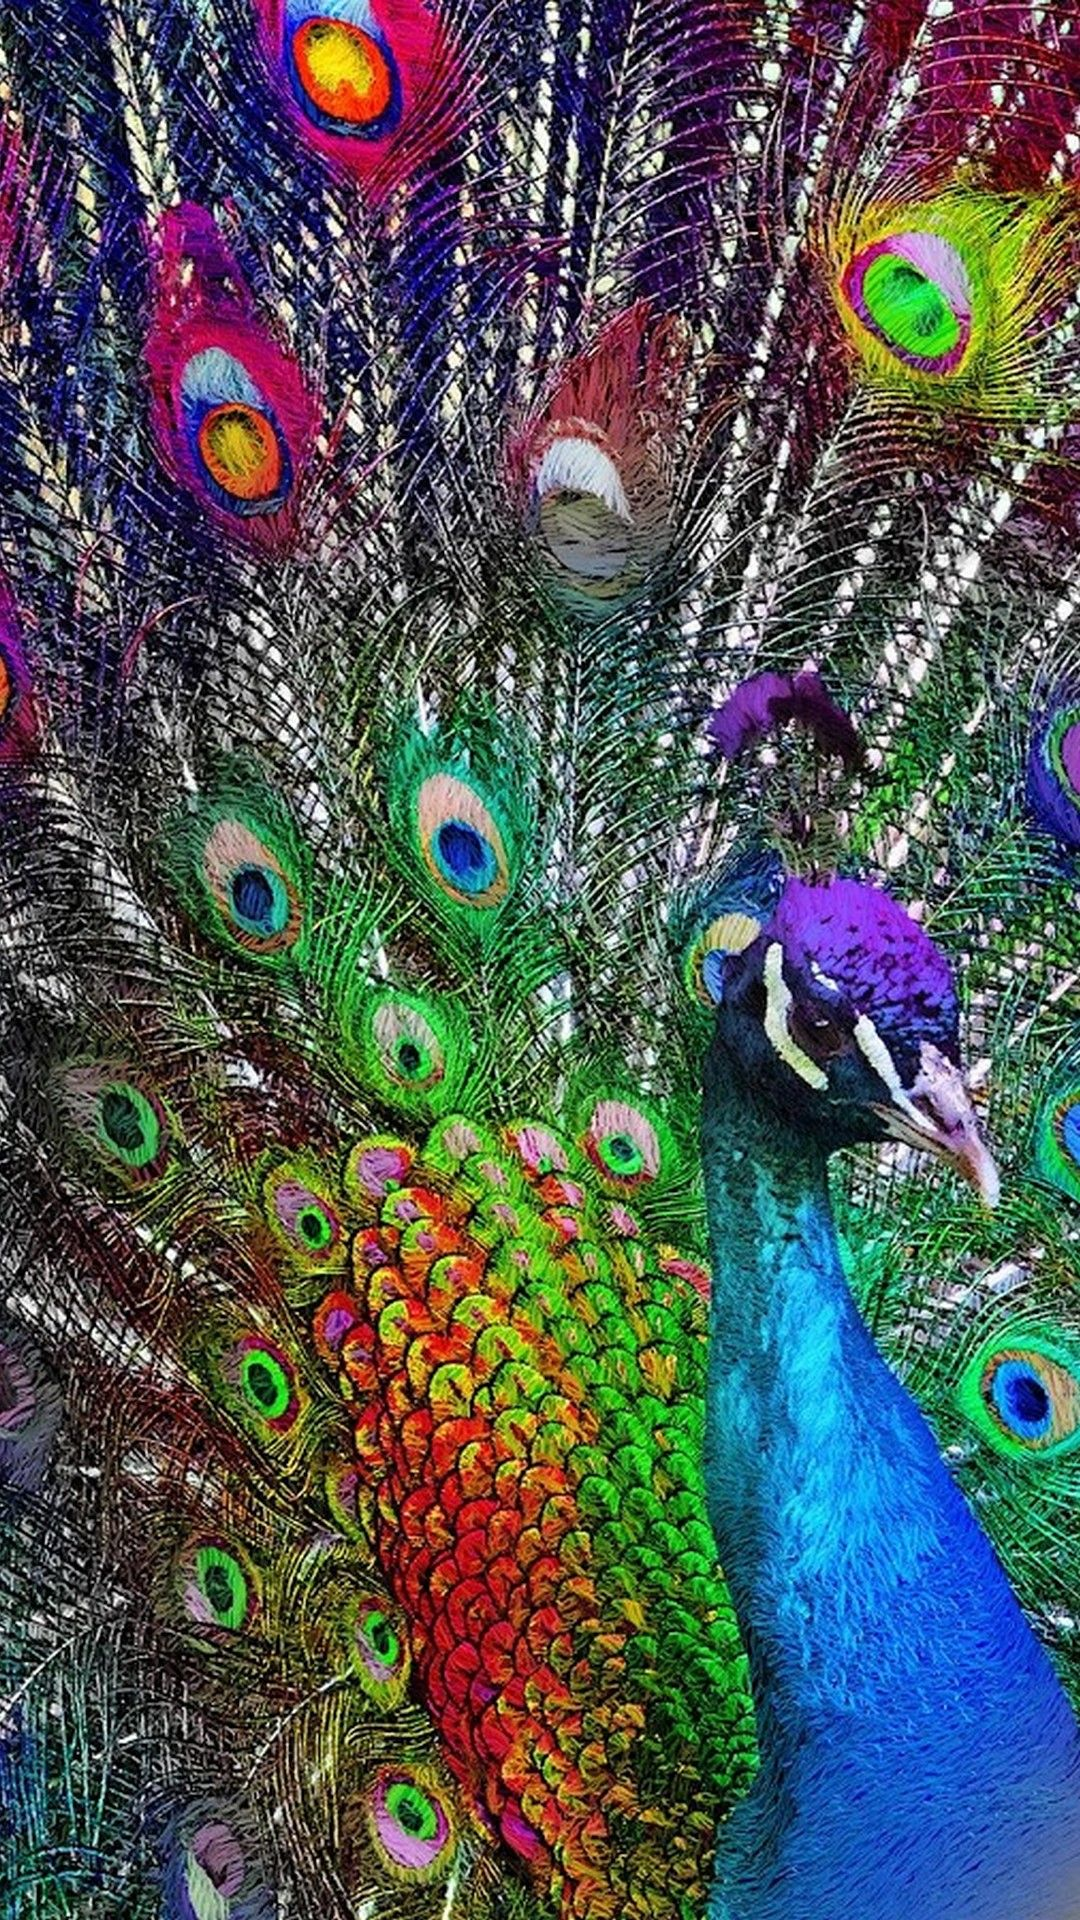 Purple Peacock Wallpaper For Iphone Best Iphone Wallpaper Peacock Wallpaper Purple Wallpaper Iphone Purple Peacock